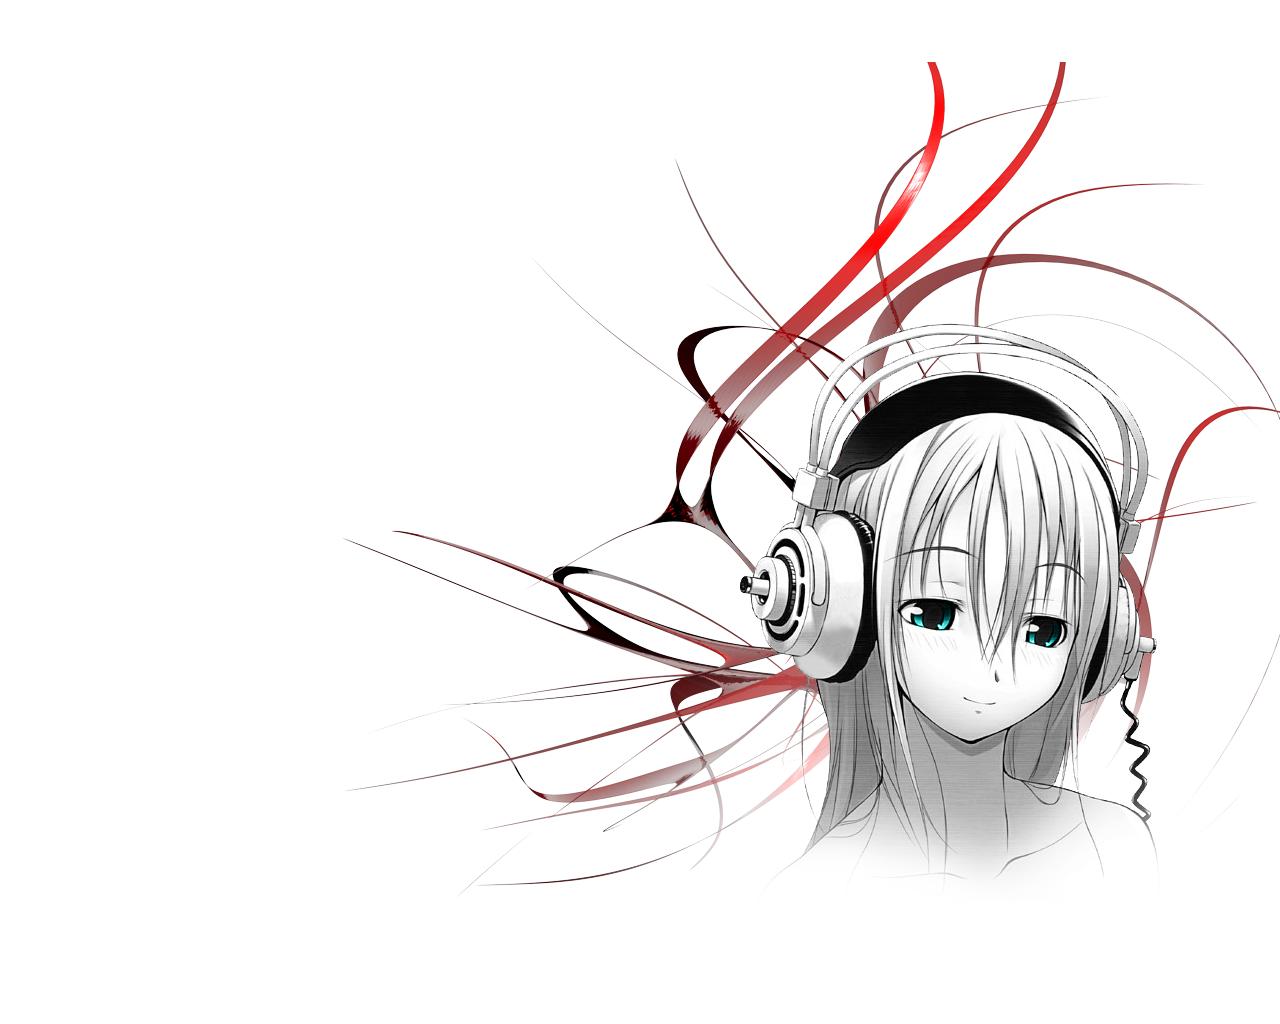 anime music images k - photo #47